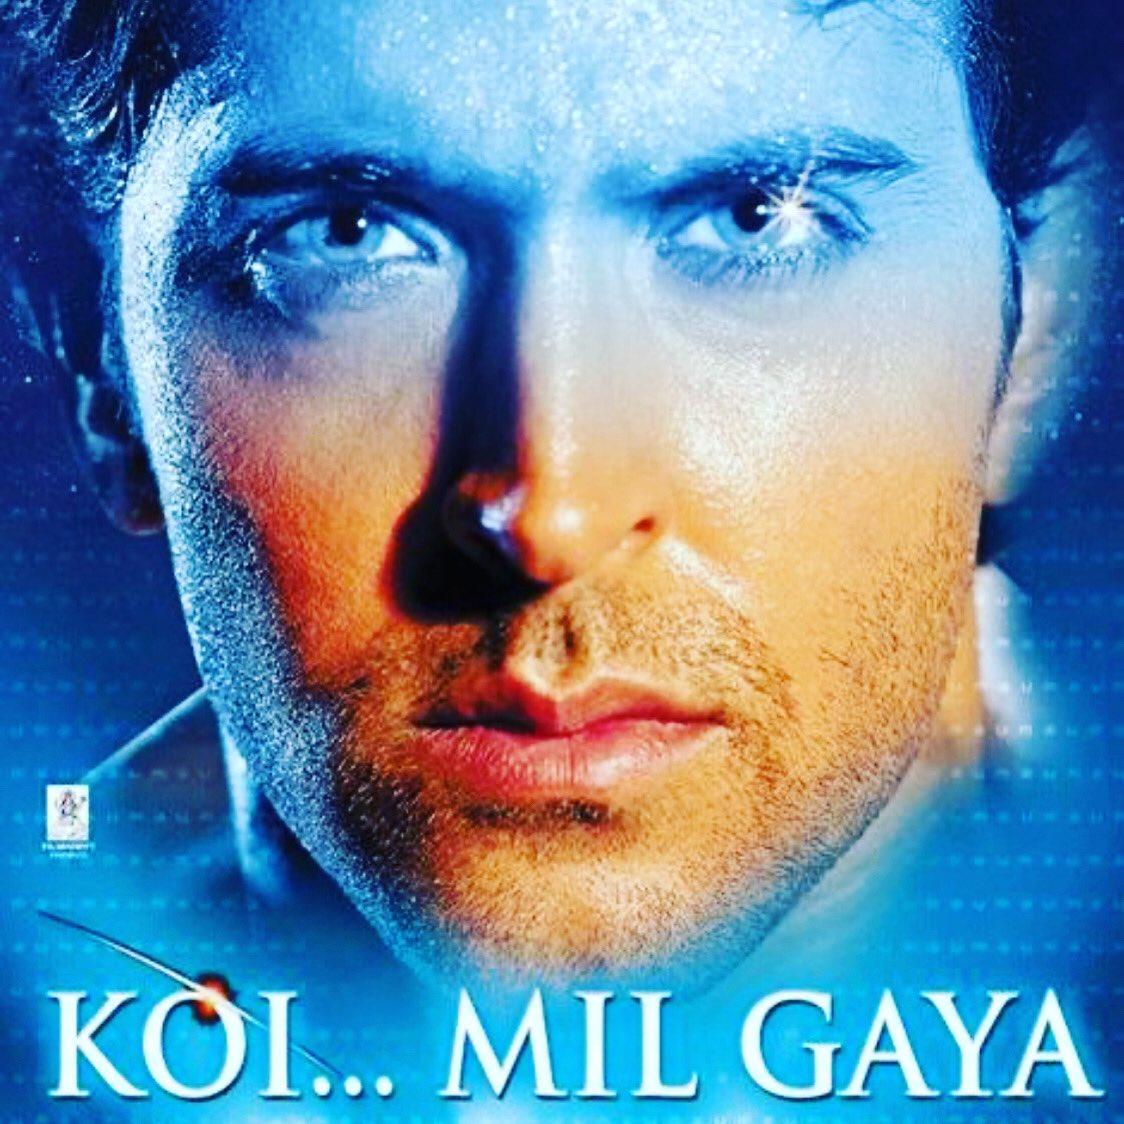 Koy Mil.... Gaya - Transl. I've met...Someone(2003)   Indian Cinema's answer to ET?  This movie launches the successful Krrish franchise,(Superhero films), one of the highest-grossing film series in India  #bollywoodmovies #koymilgaya #HrithikRoshan #preityzinta #superheropic.twitter.com/PHN8Kgmz0O